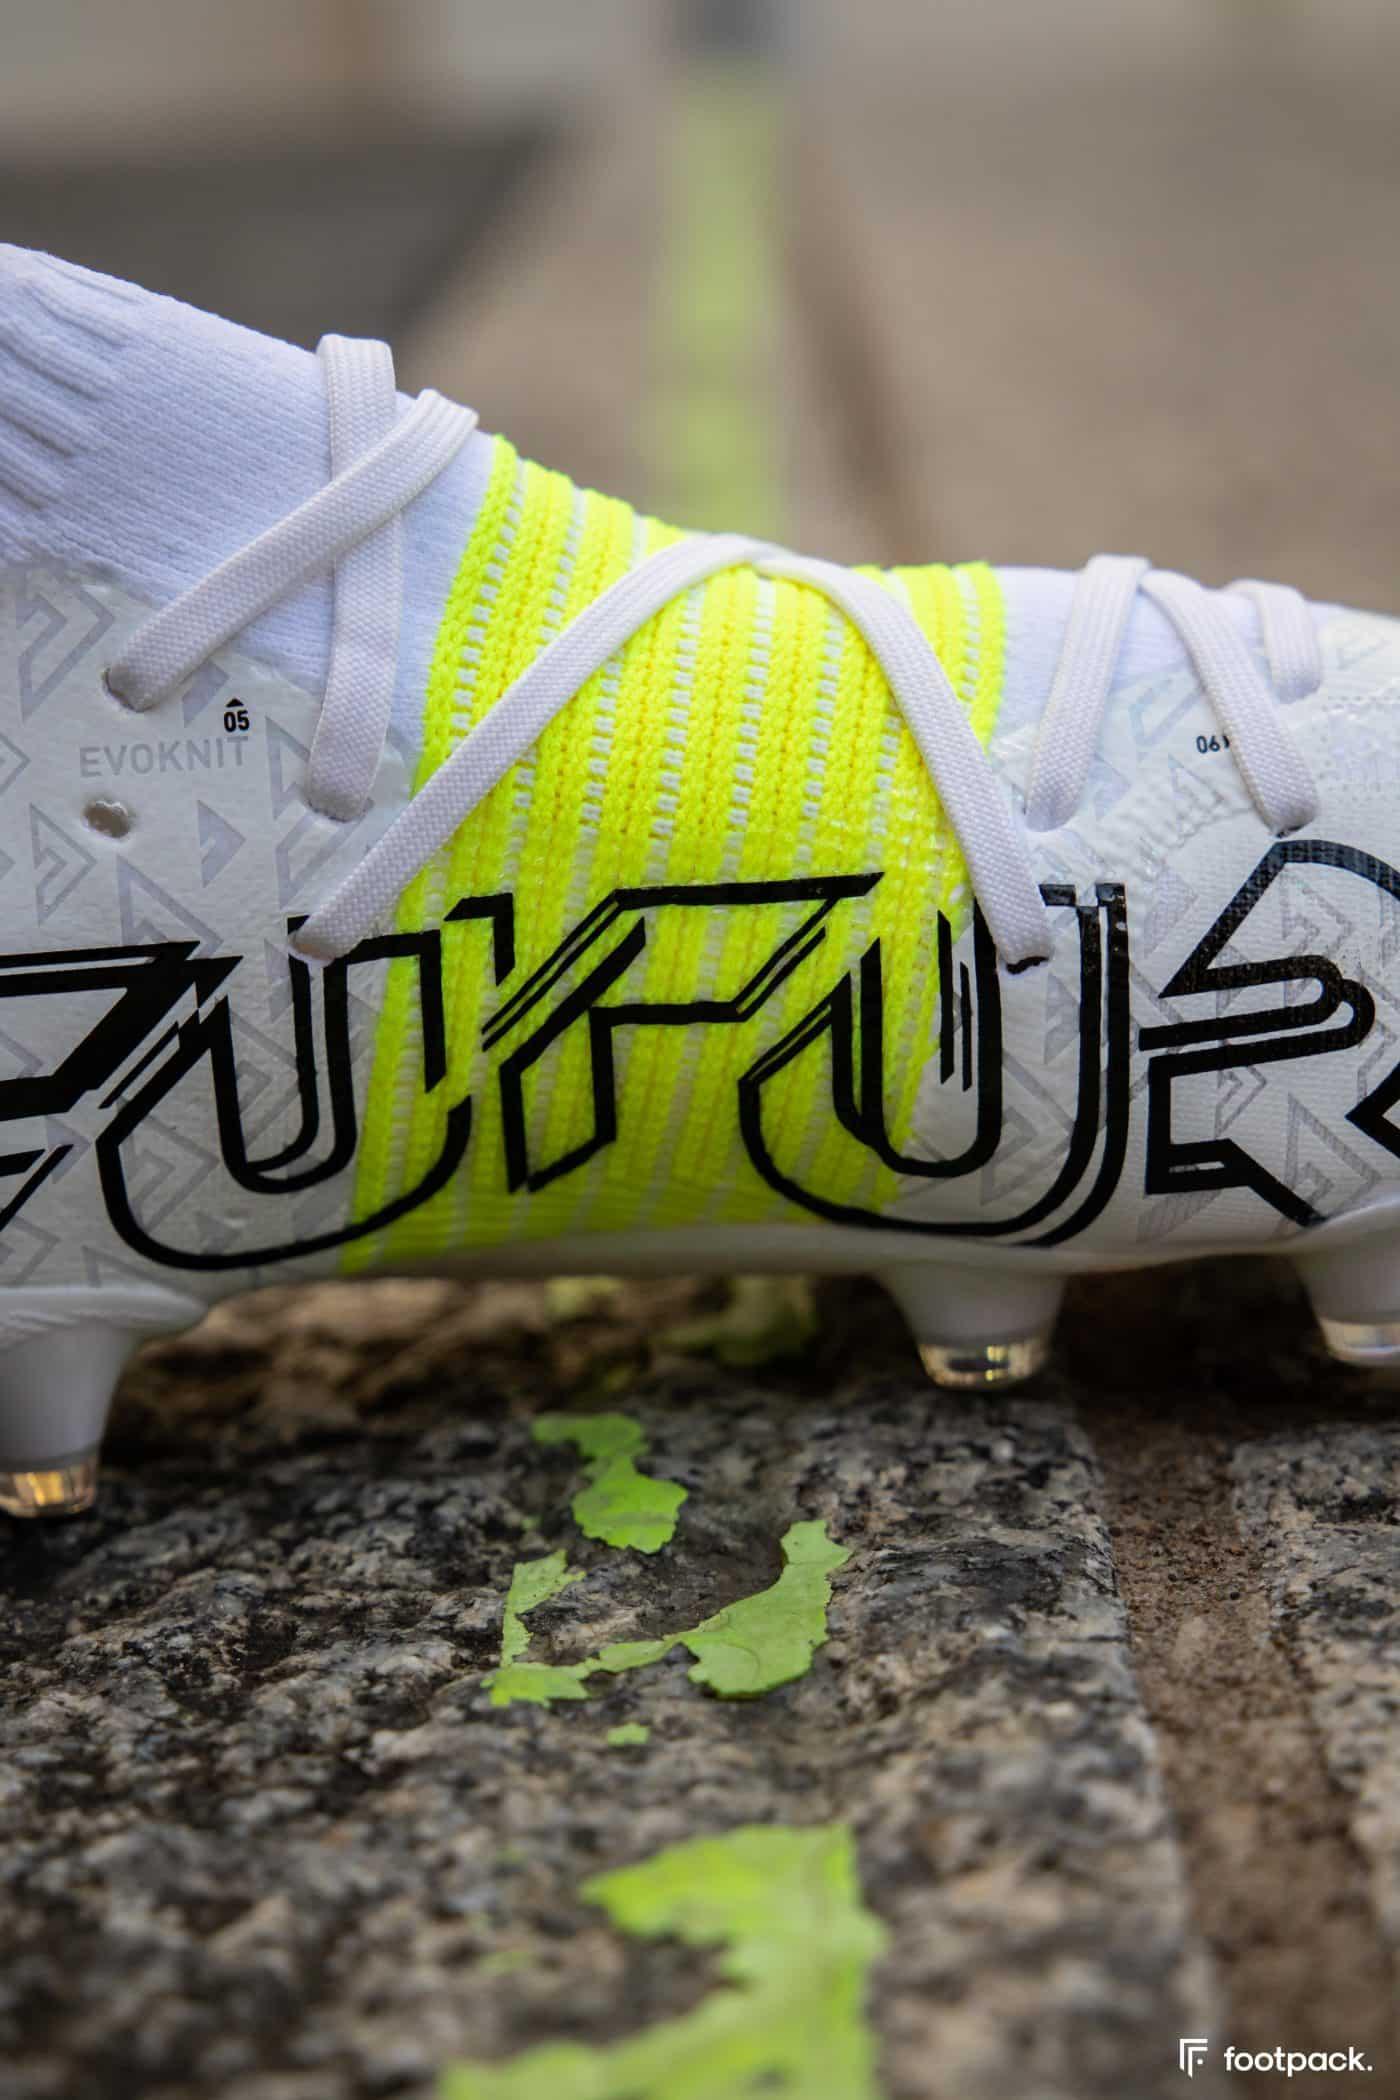 puma-future-z-teaser-edition-shooting-footpack-2